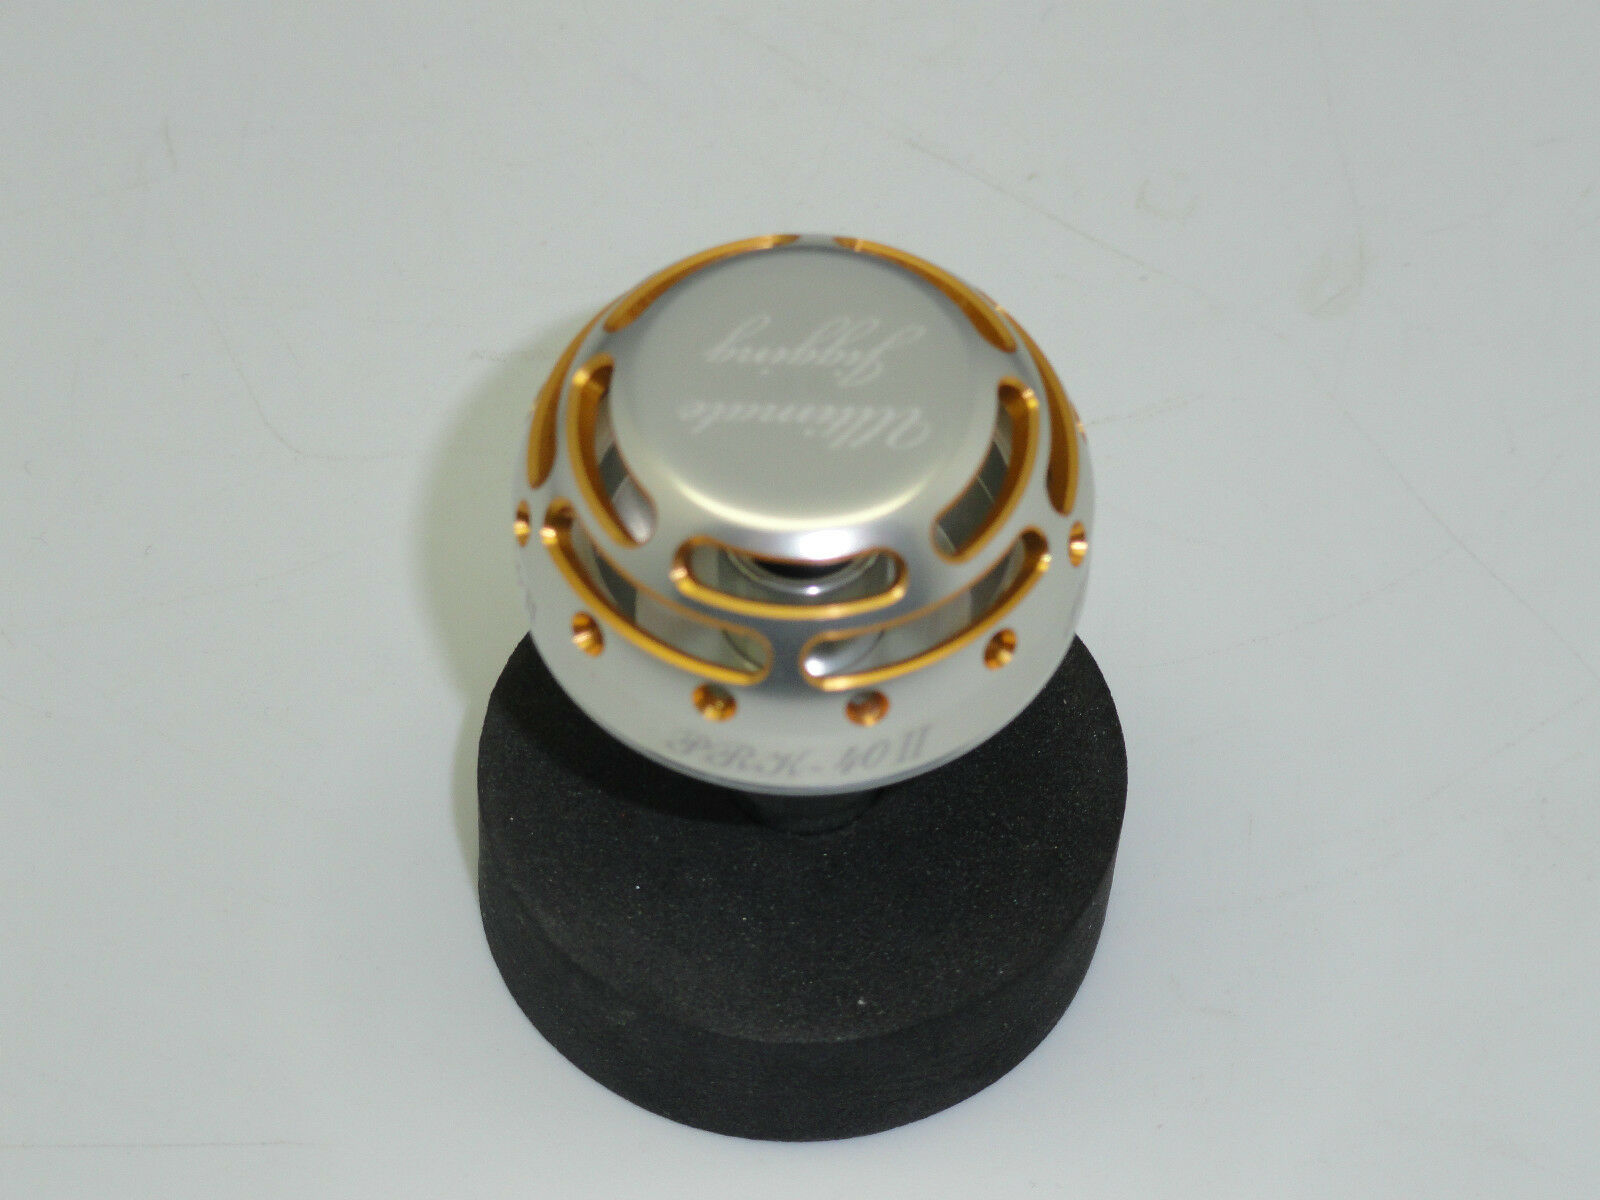 UJ PRK 40mm type II Knob for SHIMANO Stella Bio Master SW 500010000 reel SV/GD